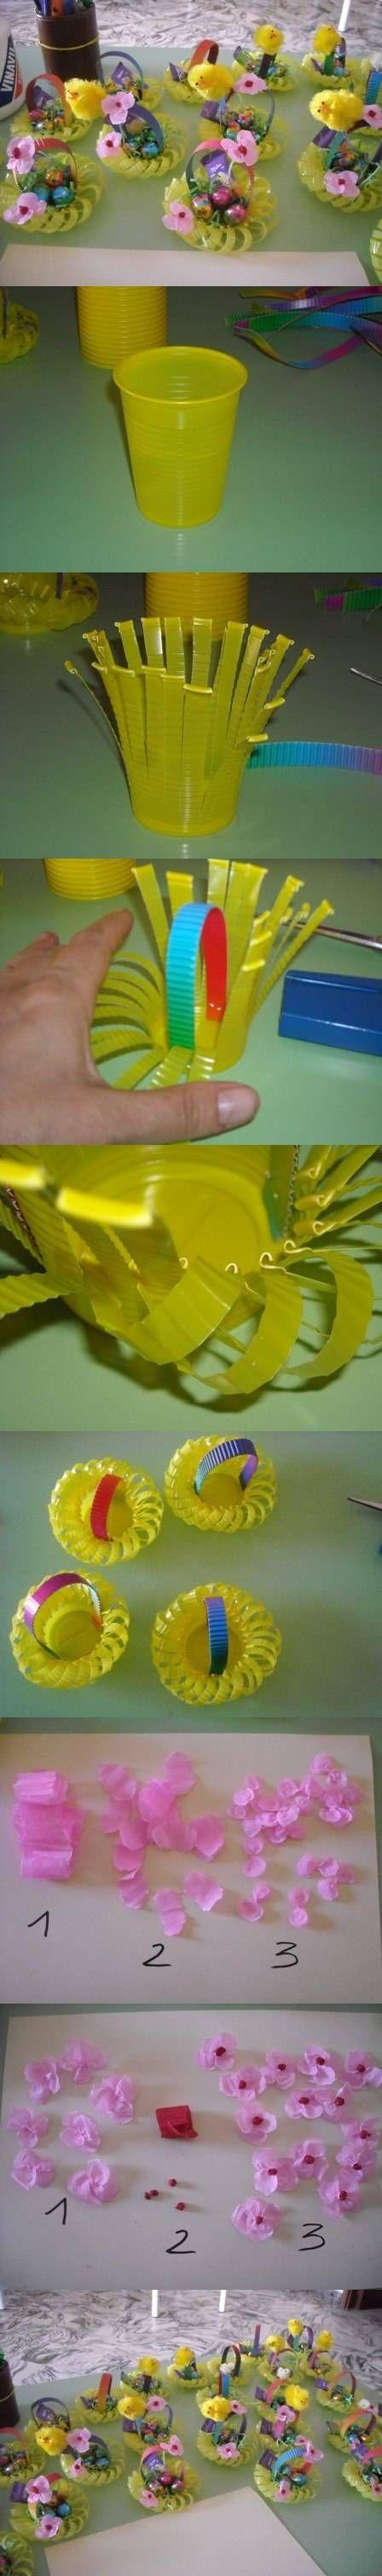 DIY Plastic Cup Flower Basket